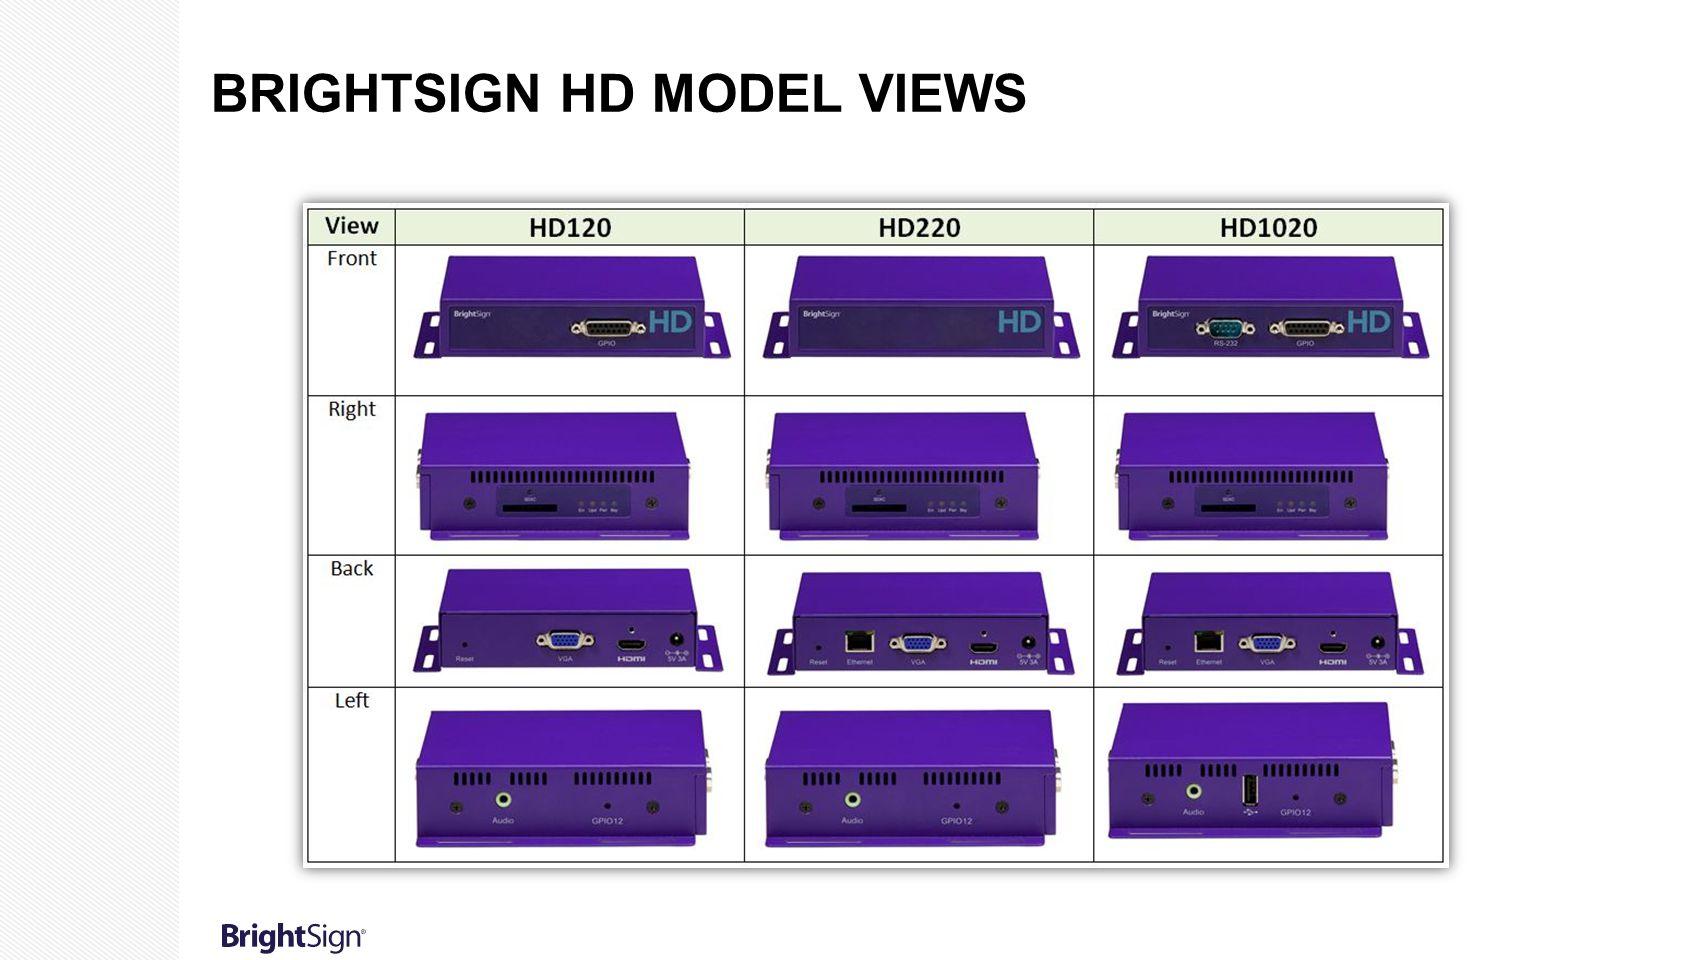 BrightSign HD Model Views